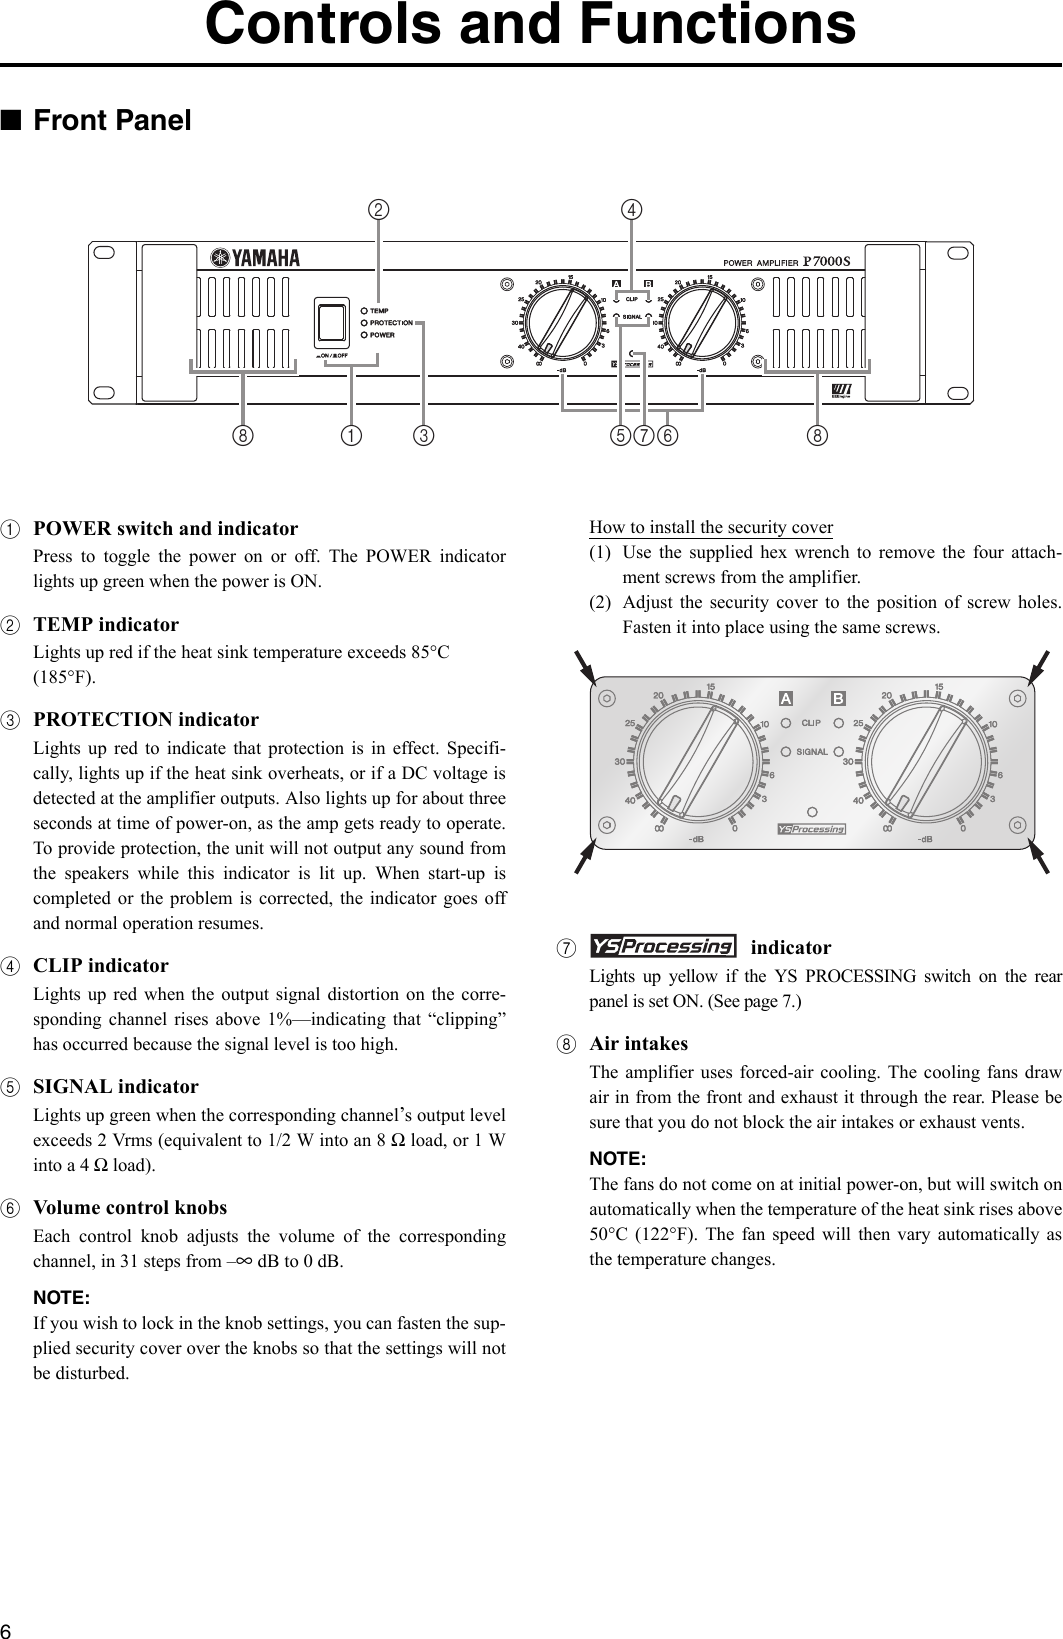 Yamaha P7000S P5000S P3500S P2500S Owners Manual P7000S ... on